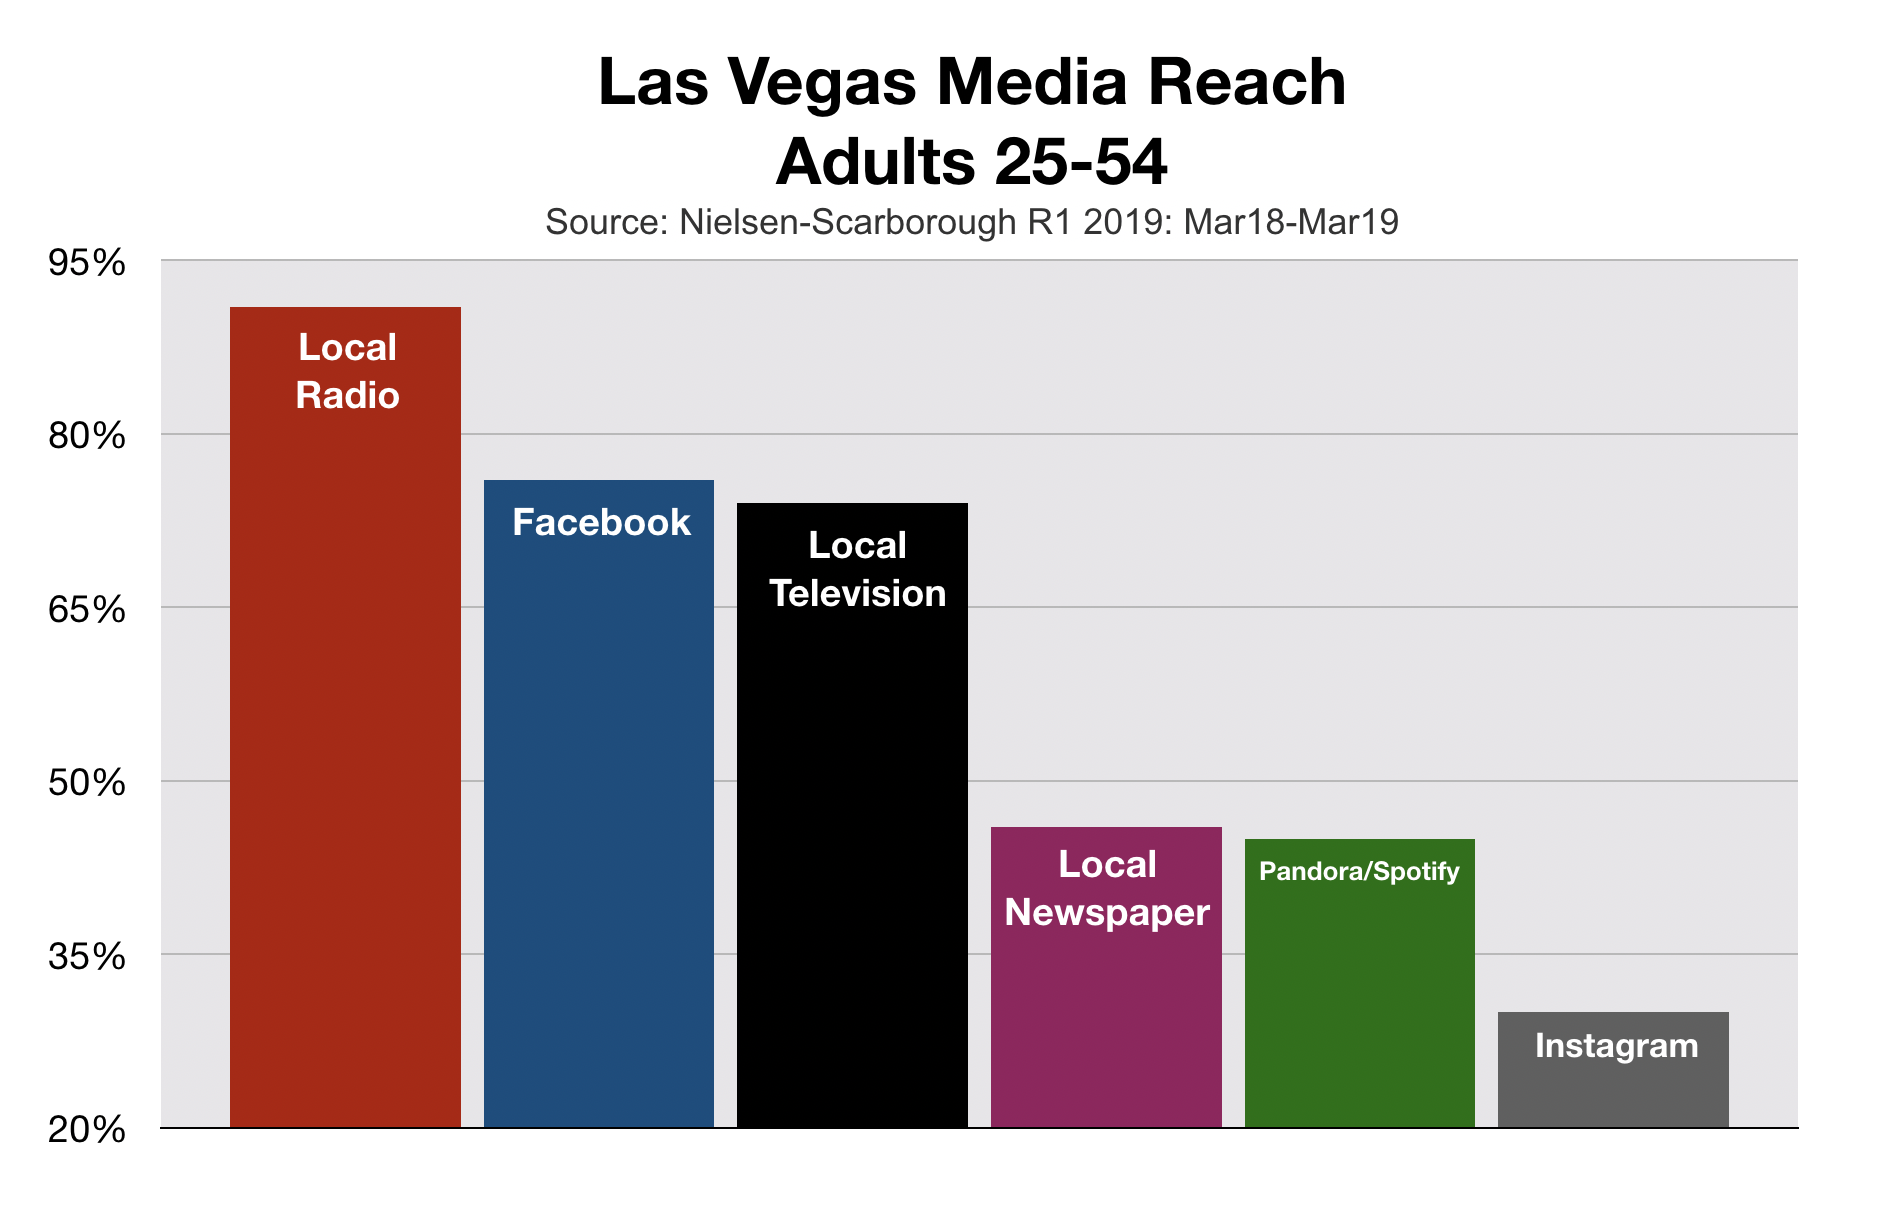 Advertise In Las Vegas Media Reach Adults 25-54